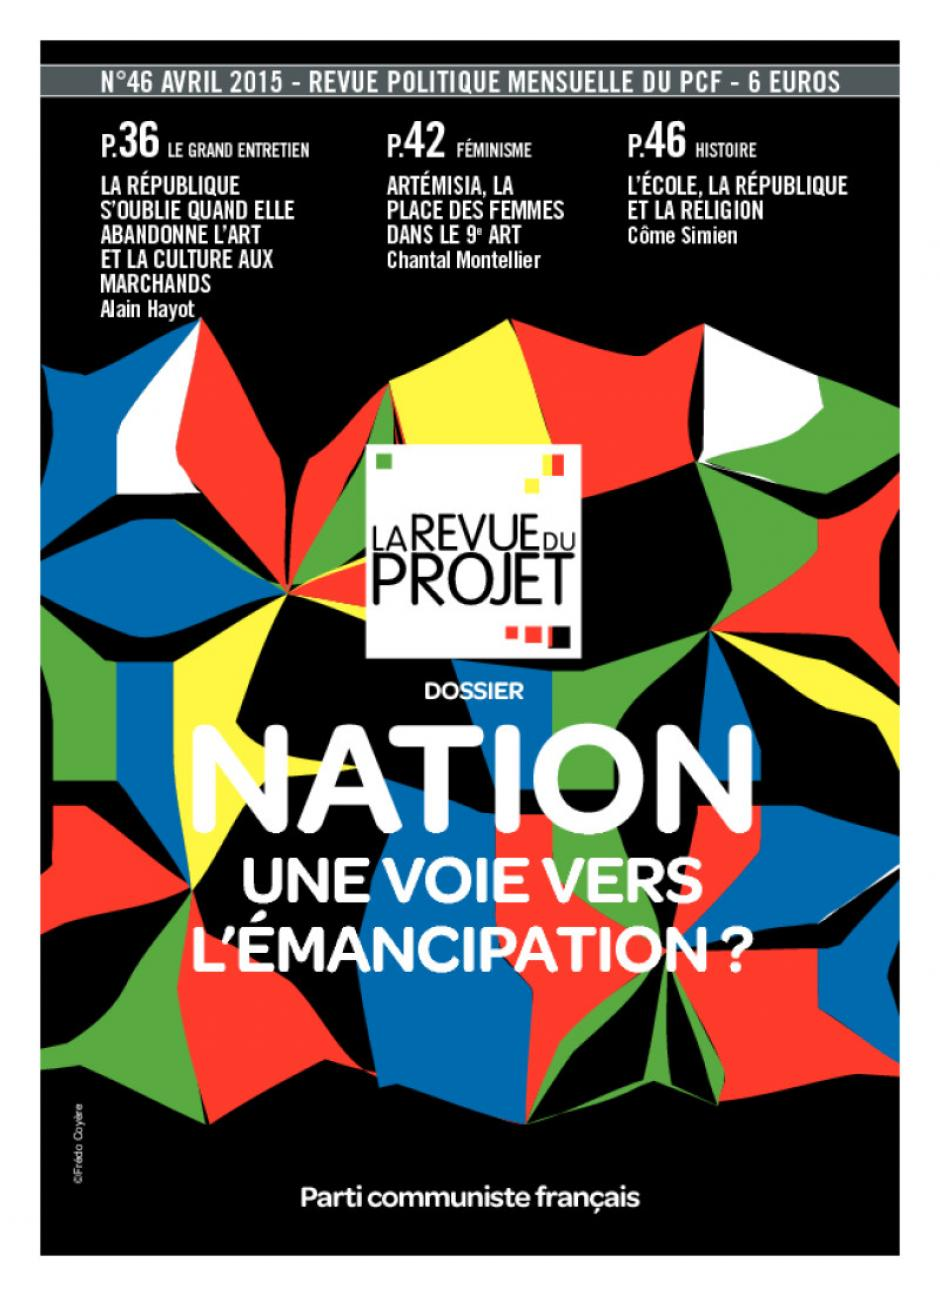 La Revue du projet, n°46, avril 2015